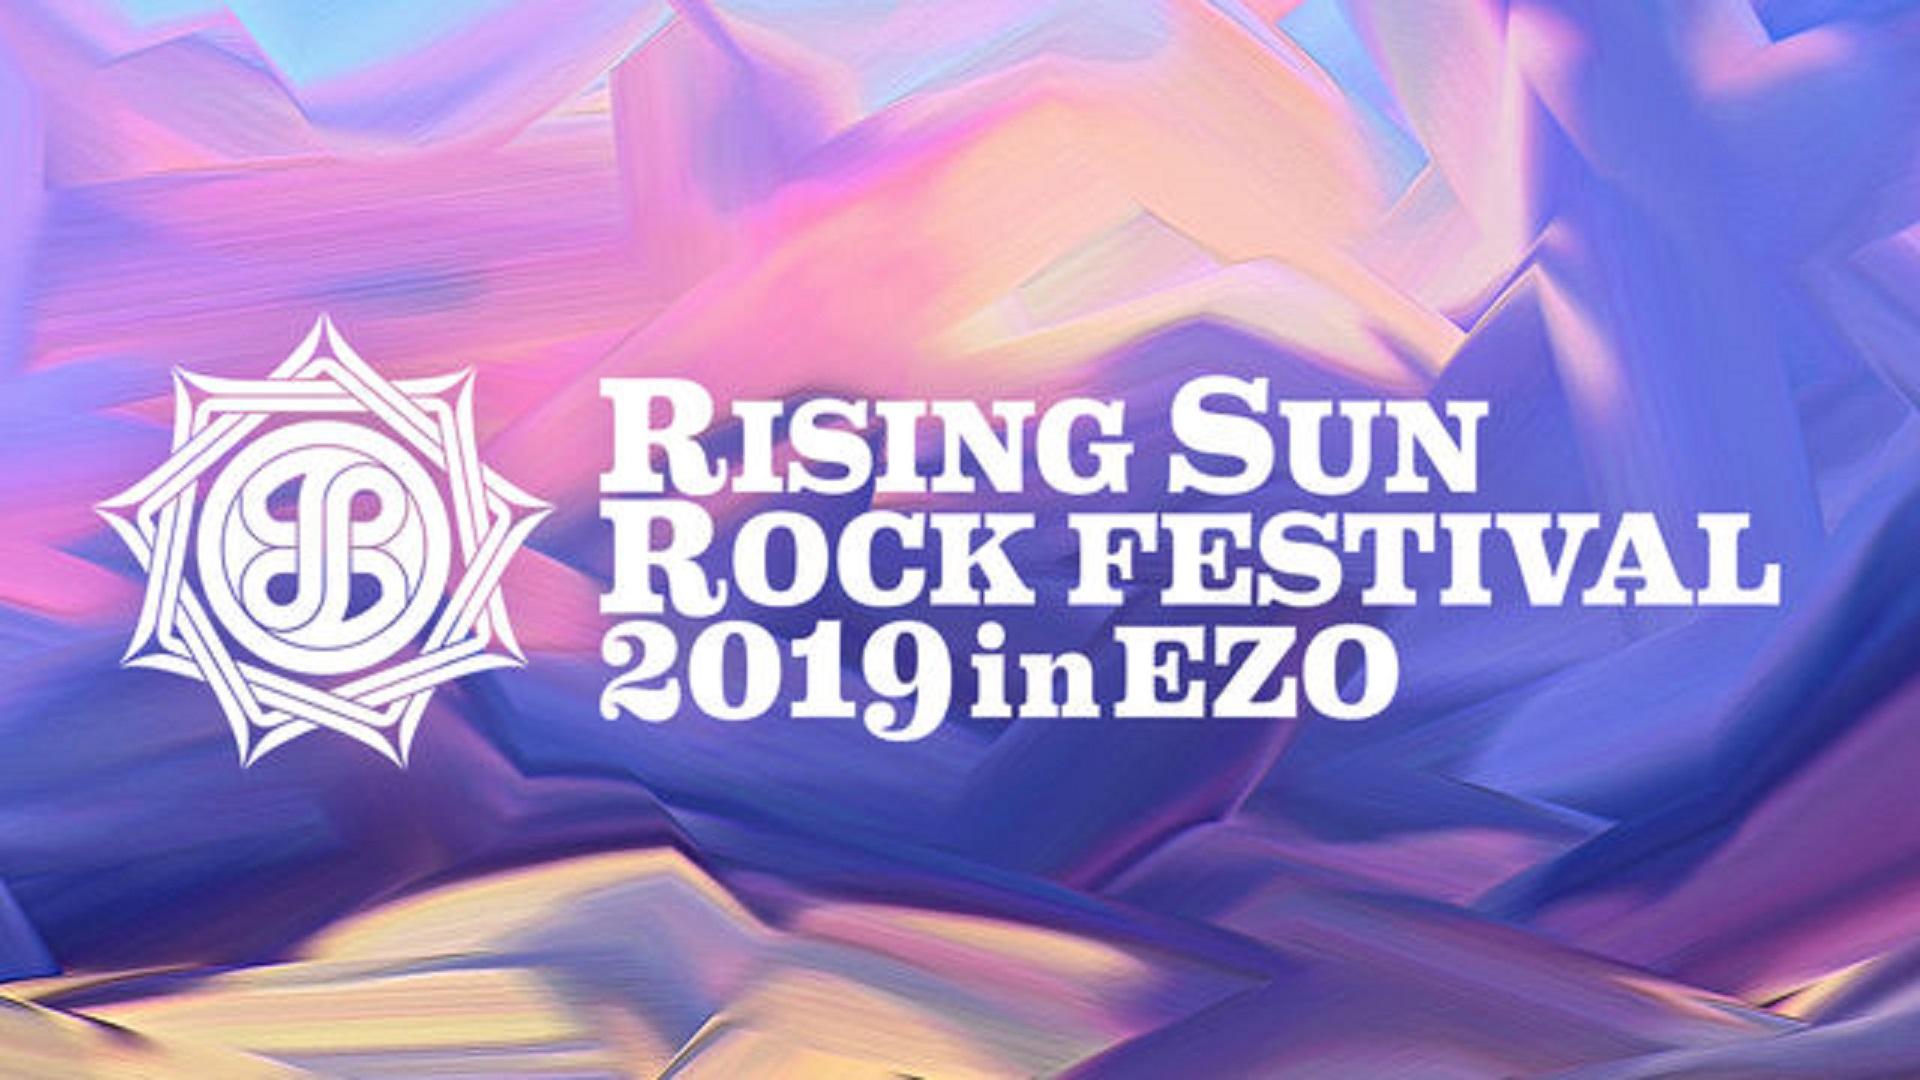 『RISING SUN ROCK FESTIVAL 2019 in EZO』、「GYAO!」での無料配信アーティストが決定!